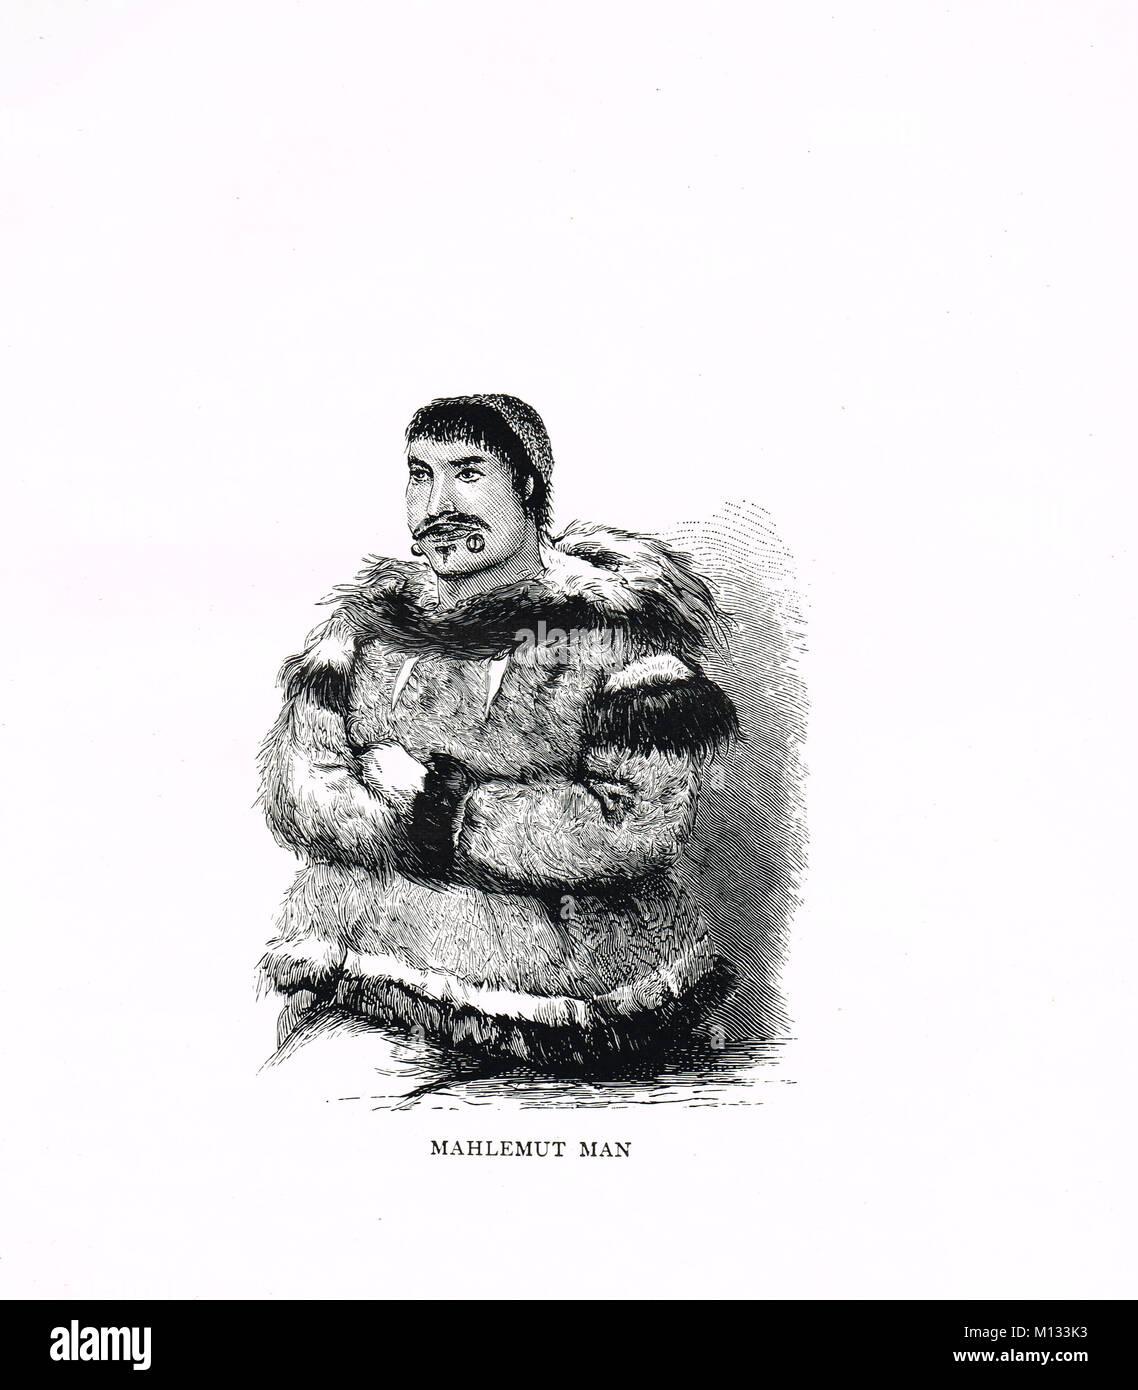 Mahlemut man, native Alaskan people, known today as Kuuvangmiut and Kobuk - Stock Image